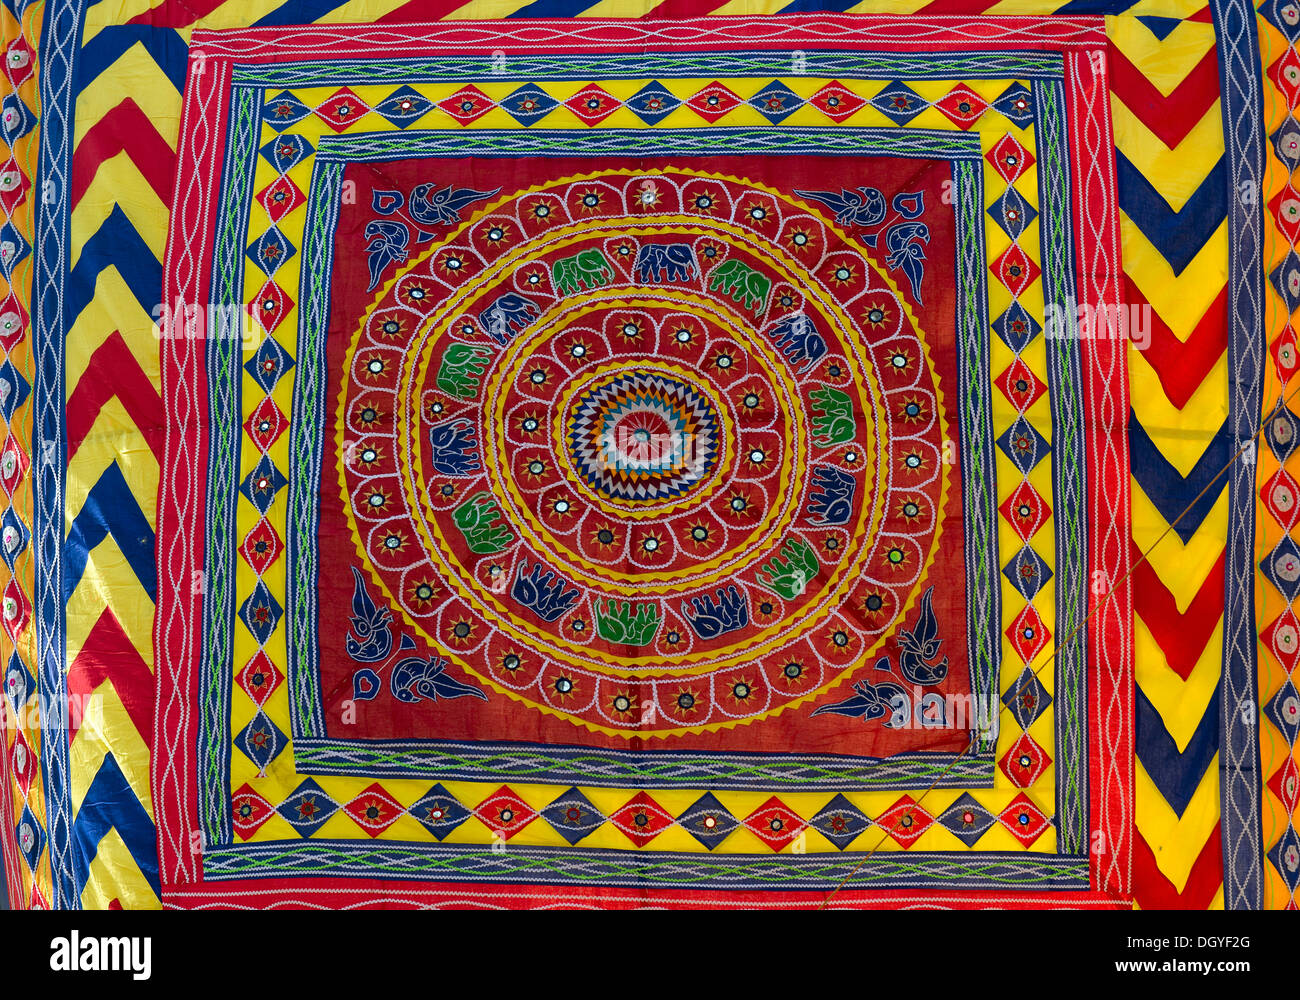 Colourful tapestry with inlaid mirrors, Pipli art from Orissa, Suraj Kund, Haryana, India - Stock Image